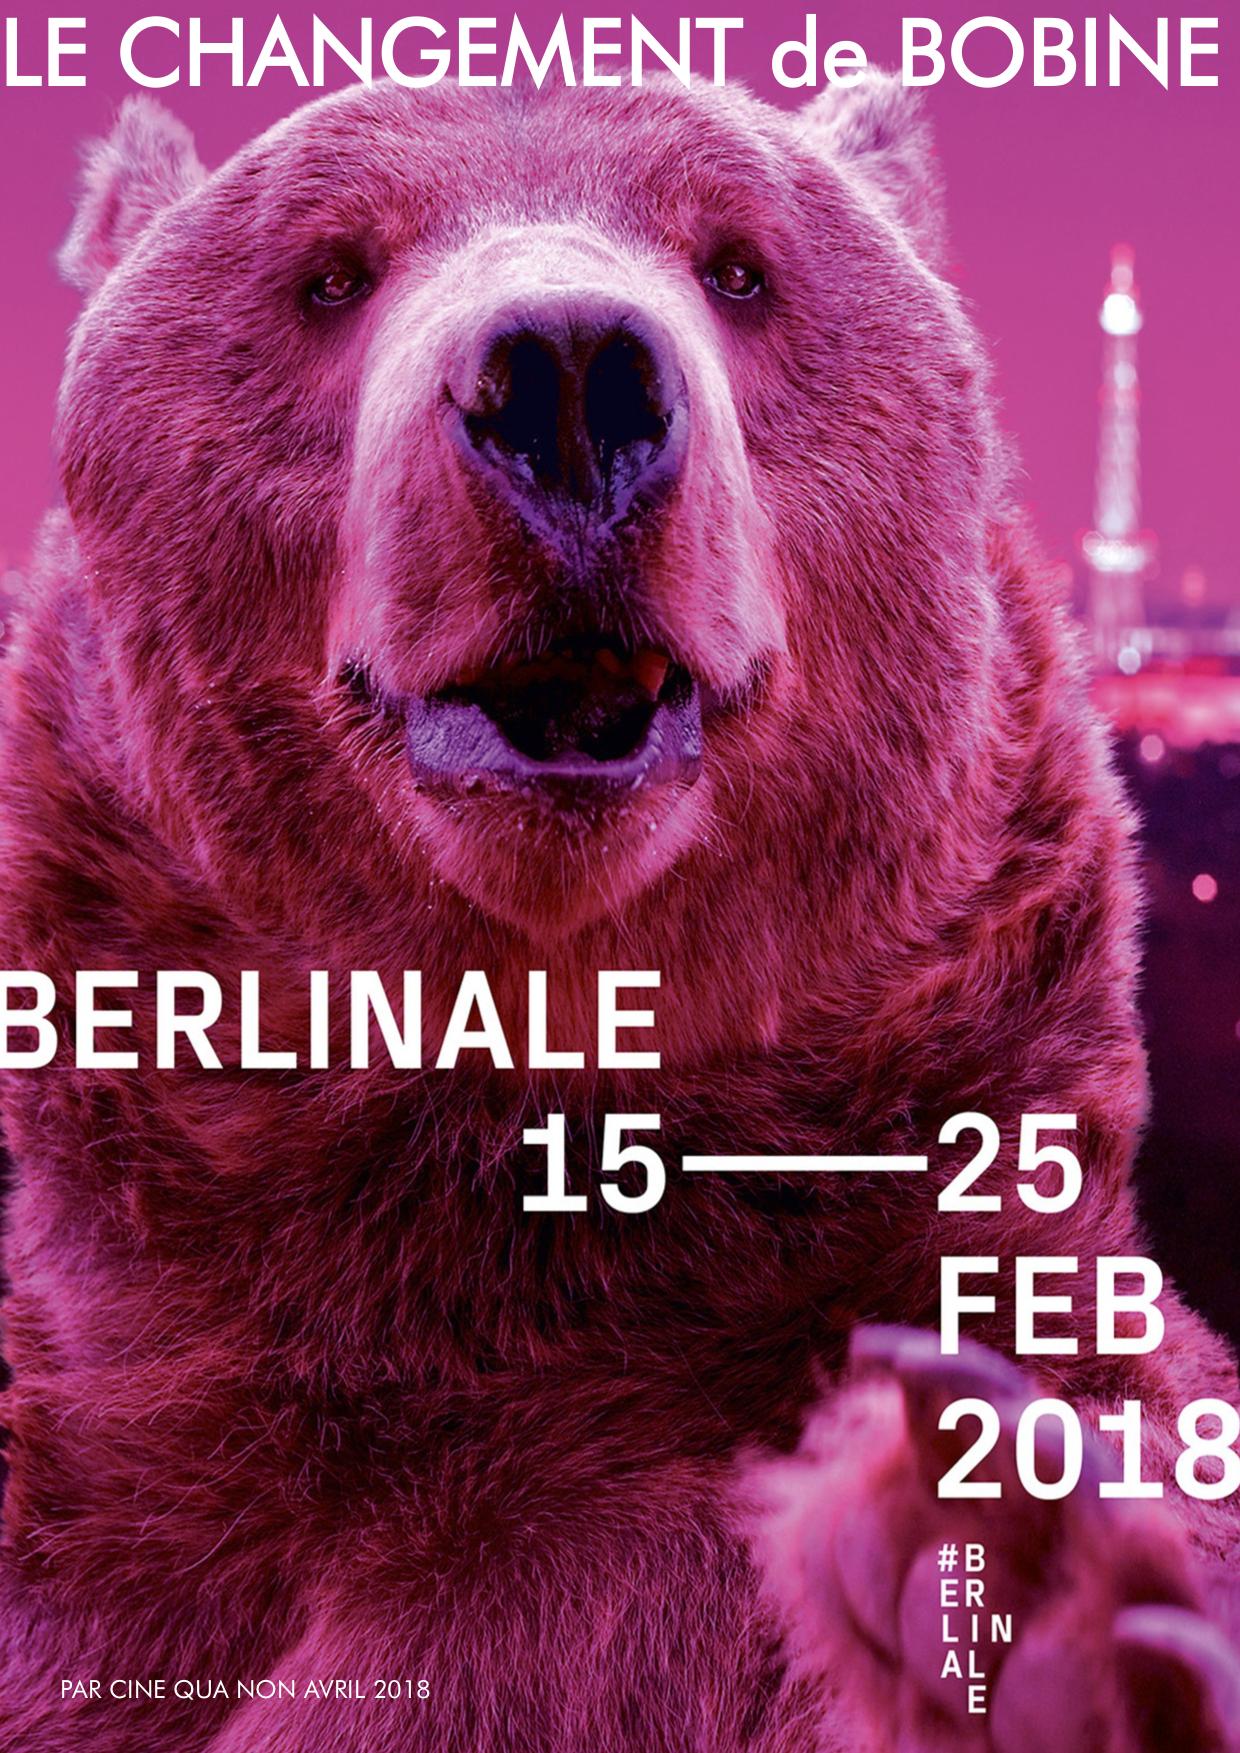 Cdb Janvier 2017 cover